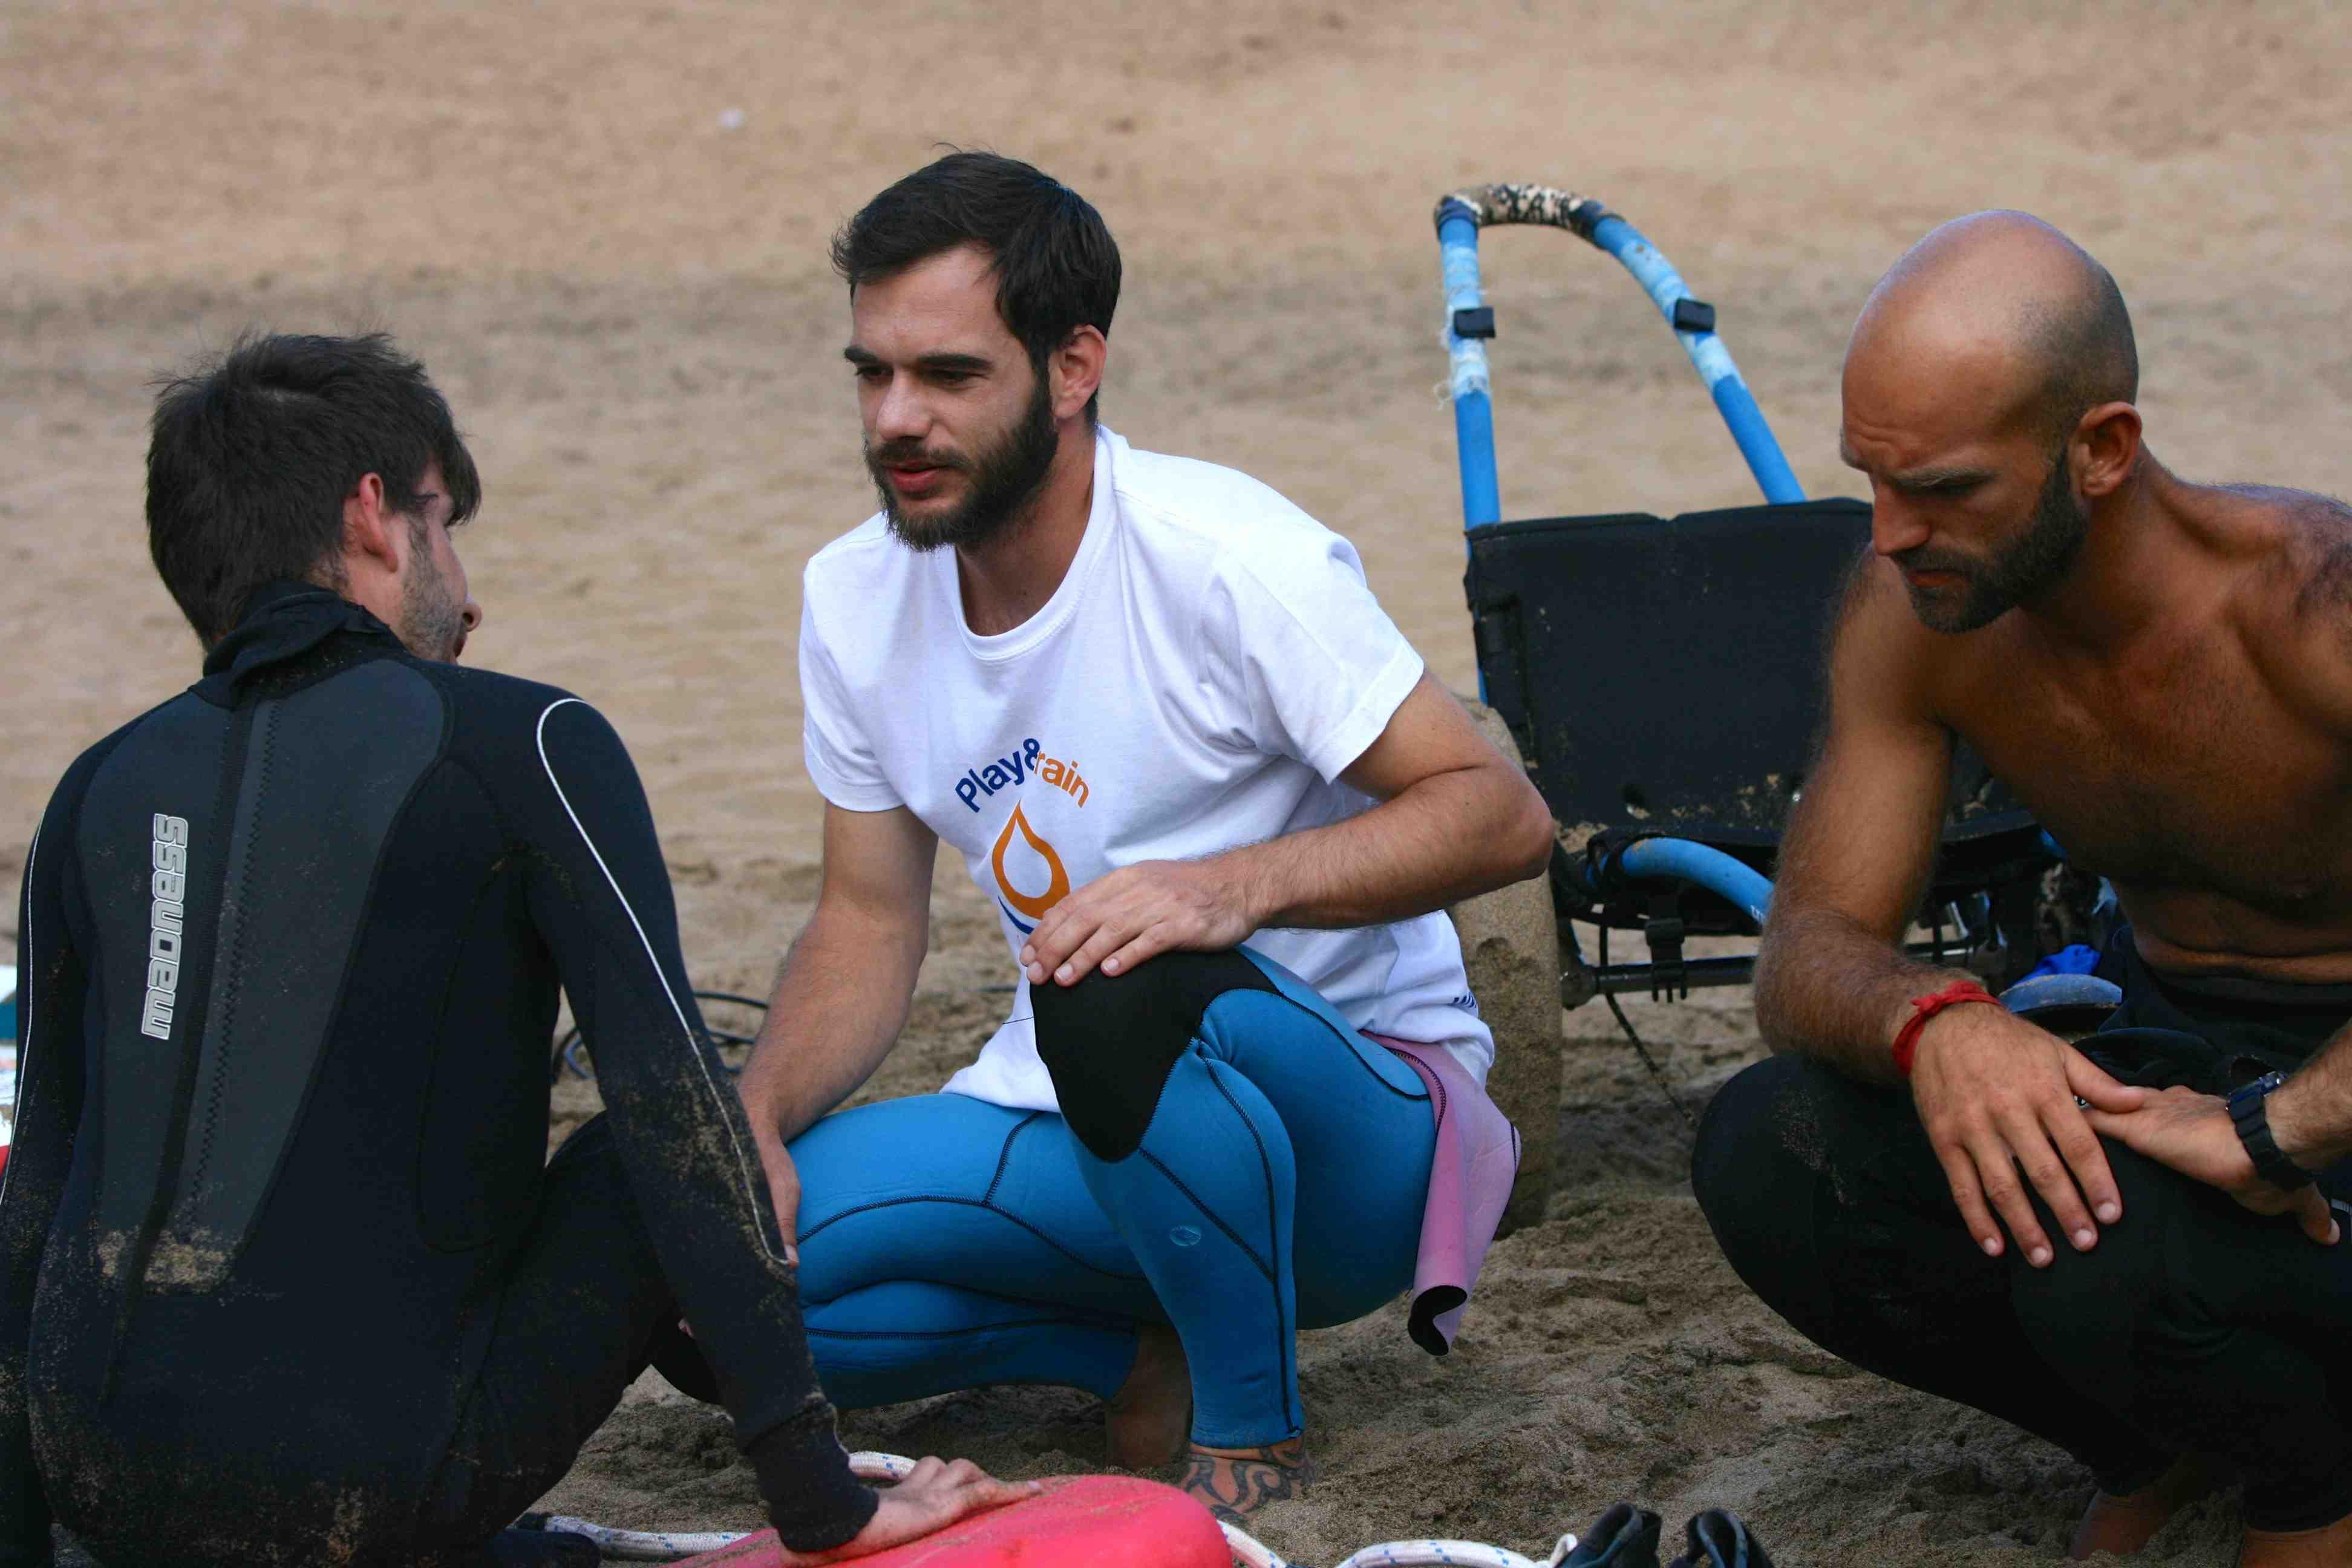 Programa Surfing4All en Fuerteventura de Play and Train